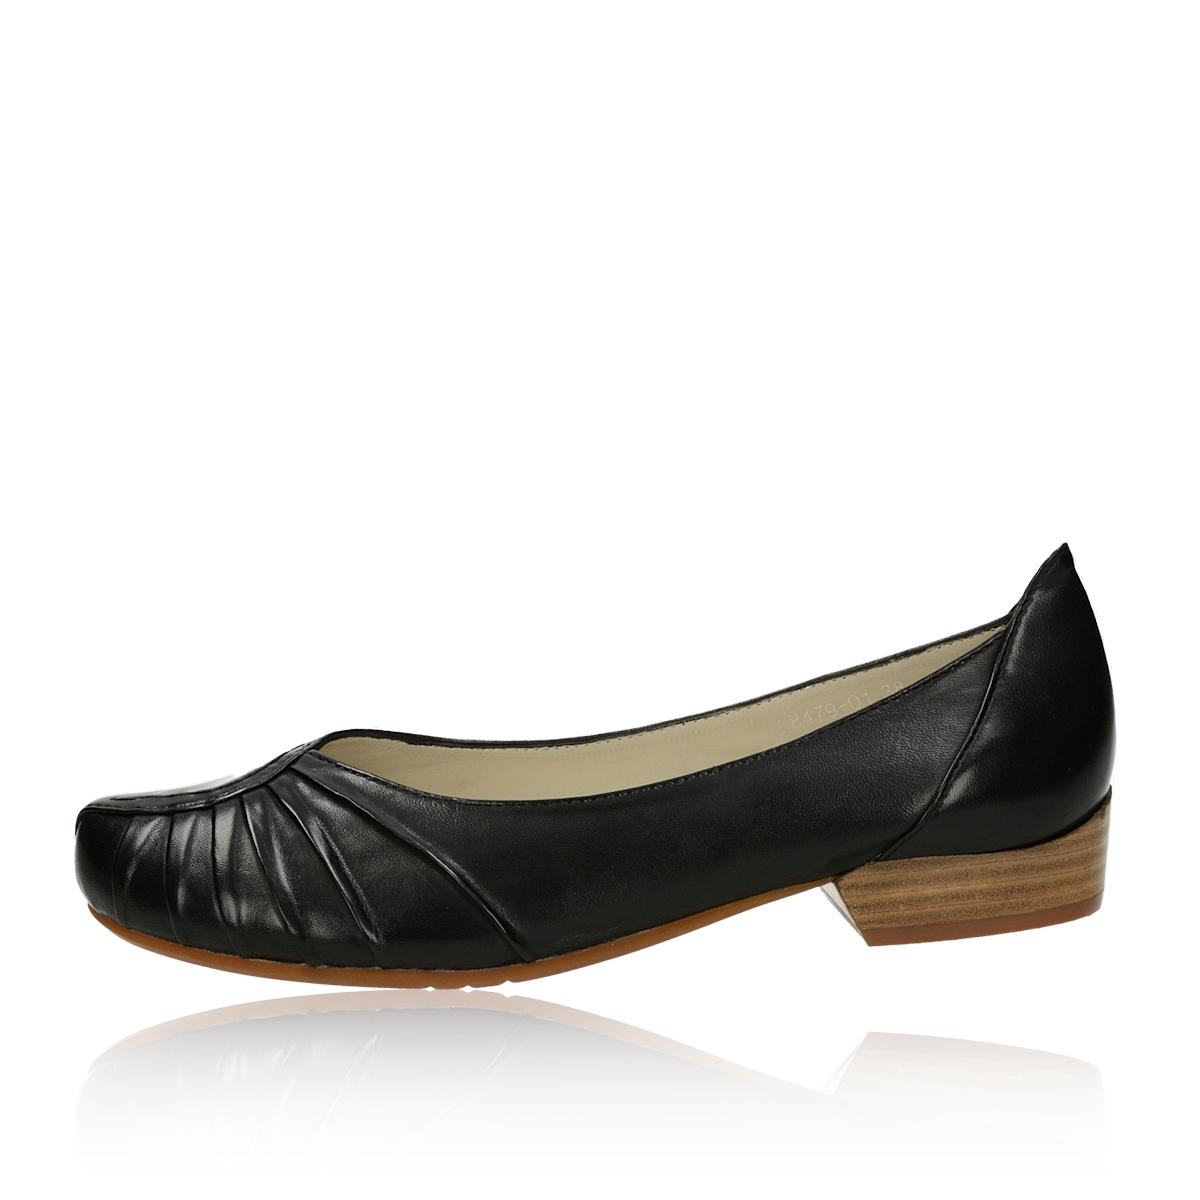 7bcf6aa4066e ... Canal Grande dámske kožené balerínky na podpätku - čierne ...